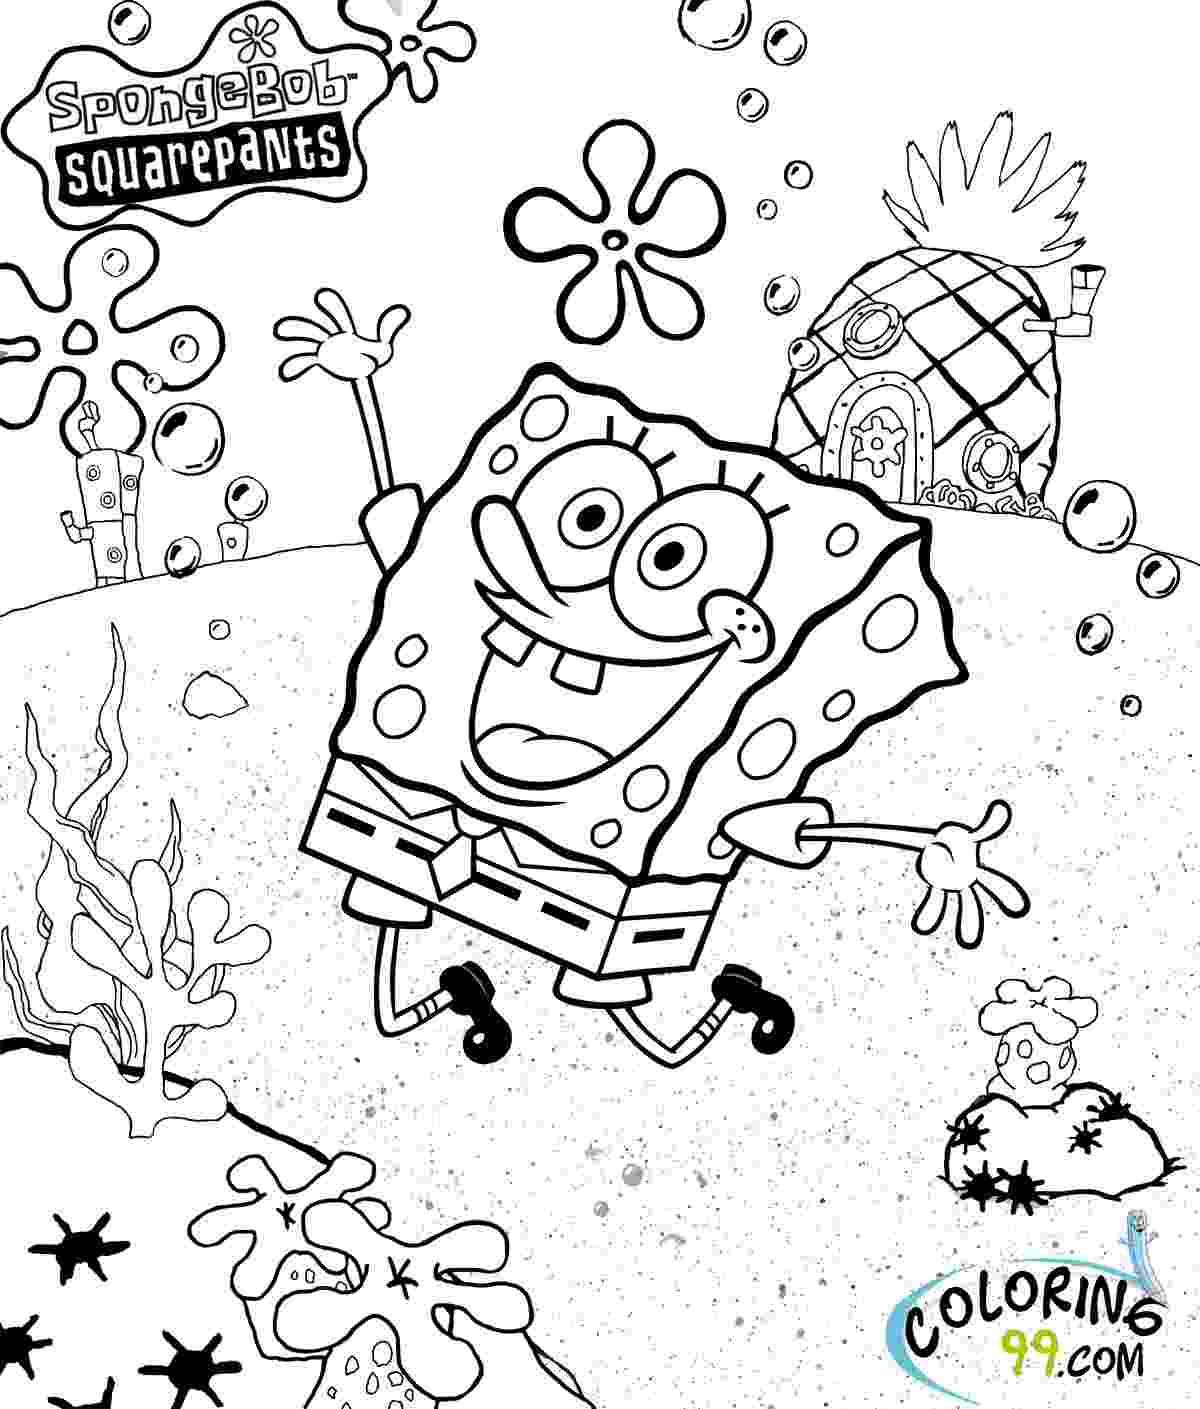 spongebob coloring book august 2013 team colors spongebob book coloring